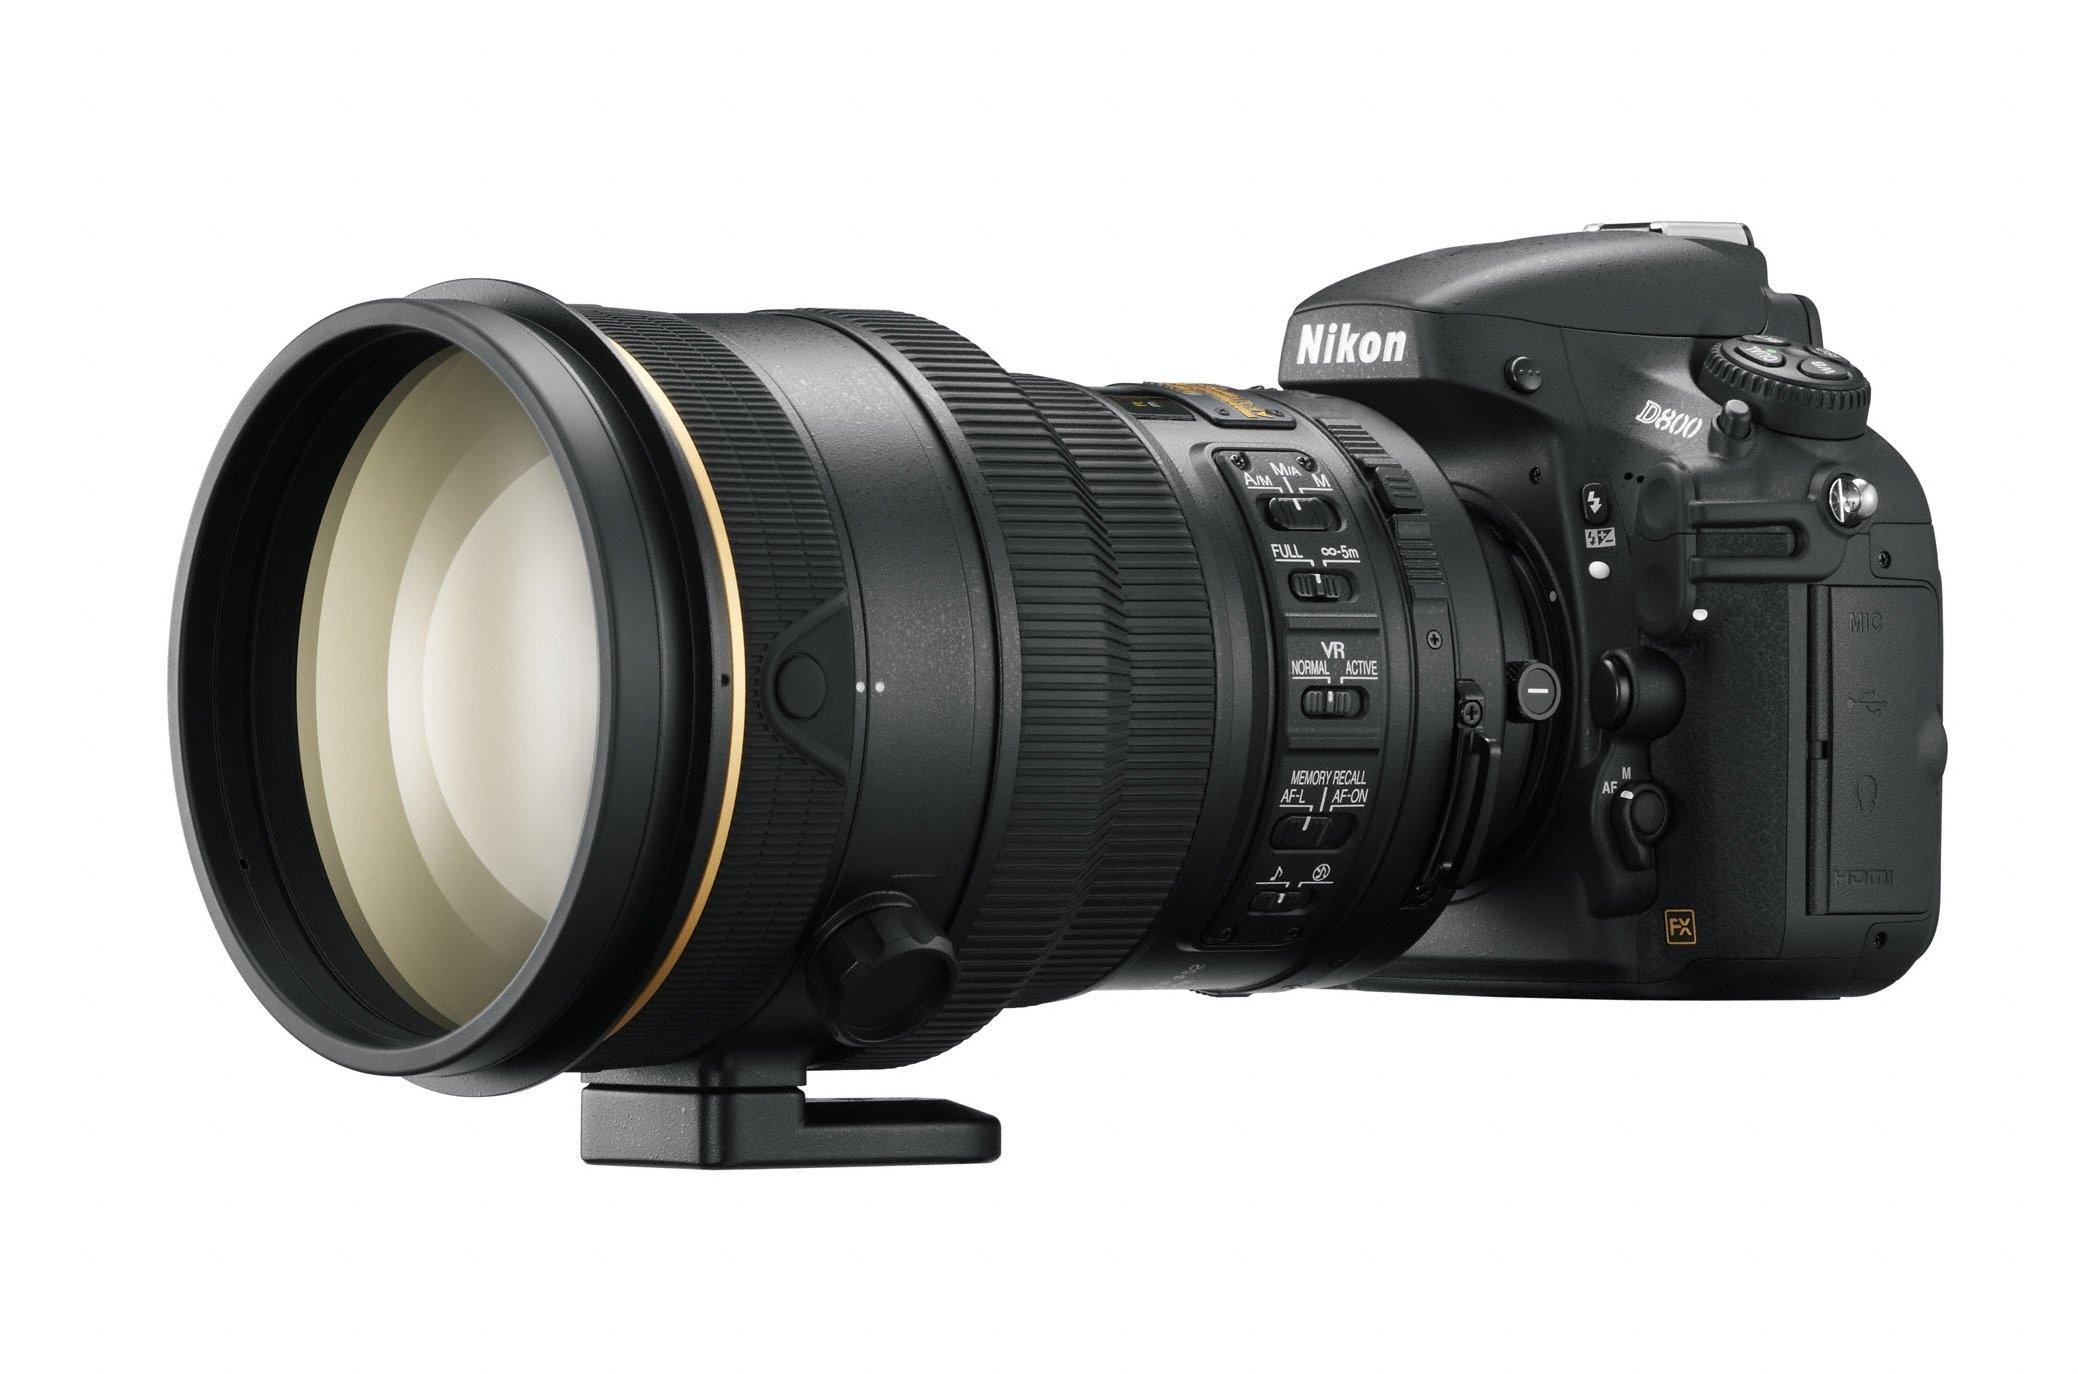 Nikon Establishes Hollywood Video Credentials As The D800 Lands Camera Lens Parts Diagram Related Keywords Images